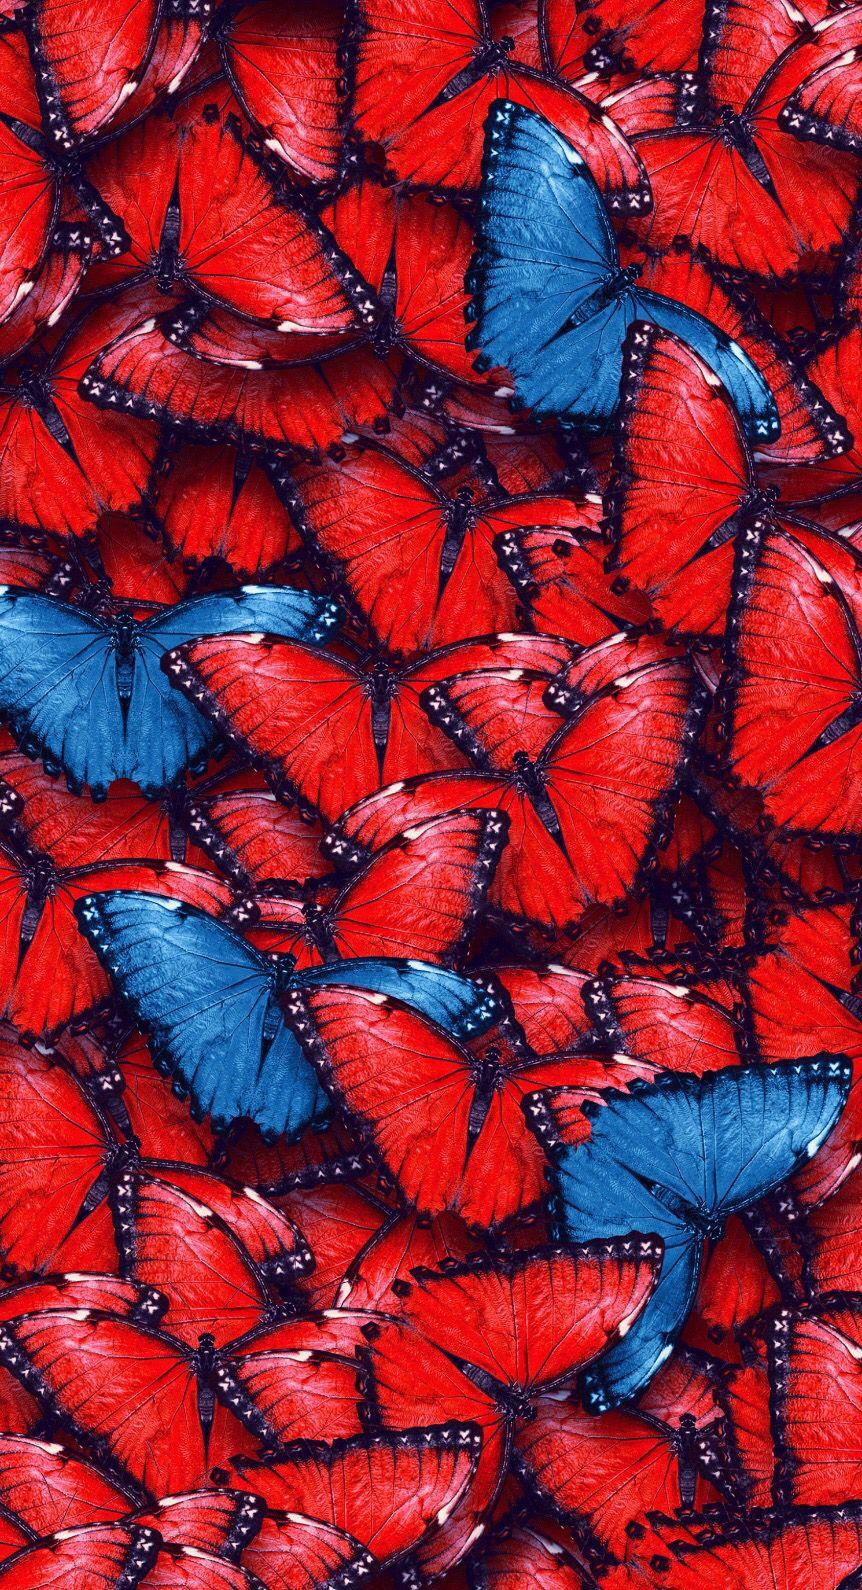 Wallpaper | Butterfly wallpaper, Red roses wallpaper, Red ...